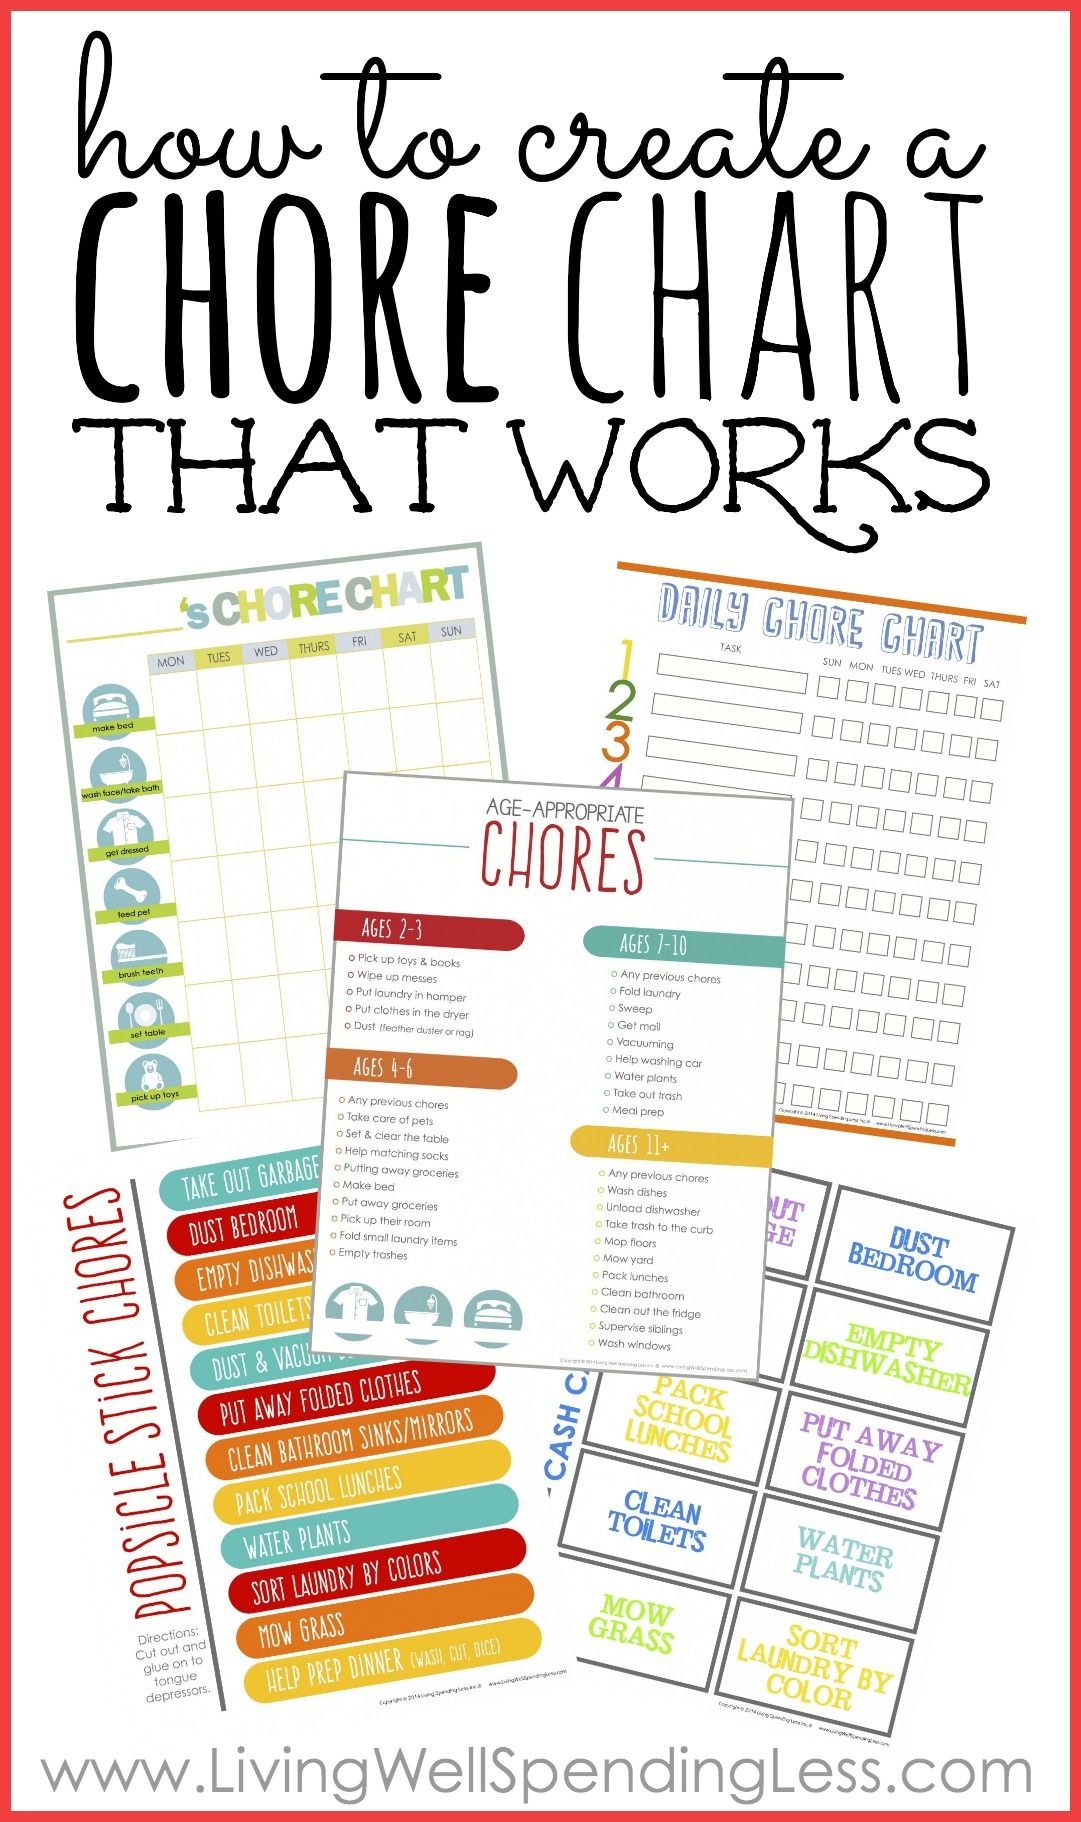 Create A Chore Chart That Works